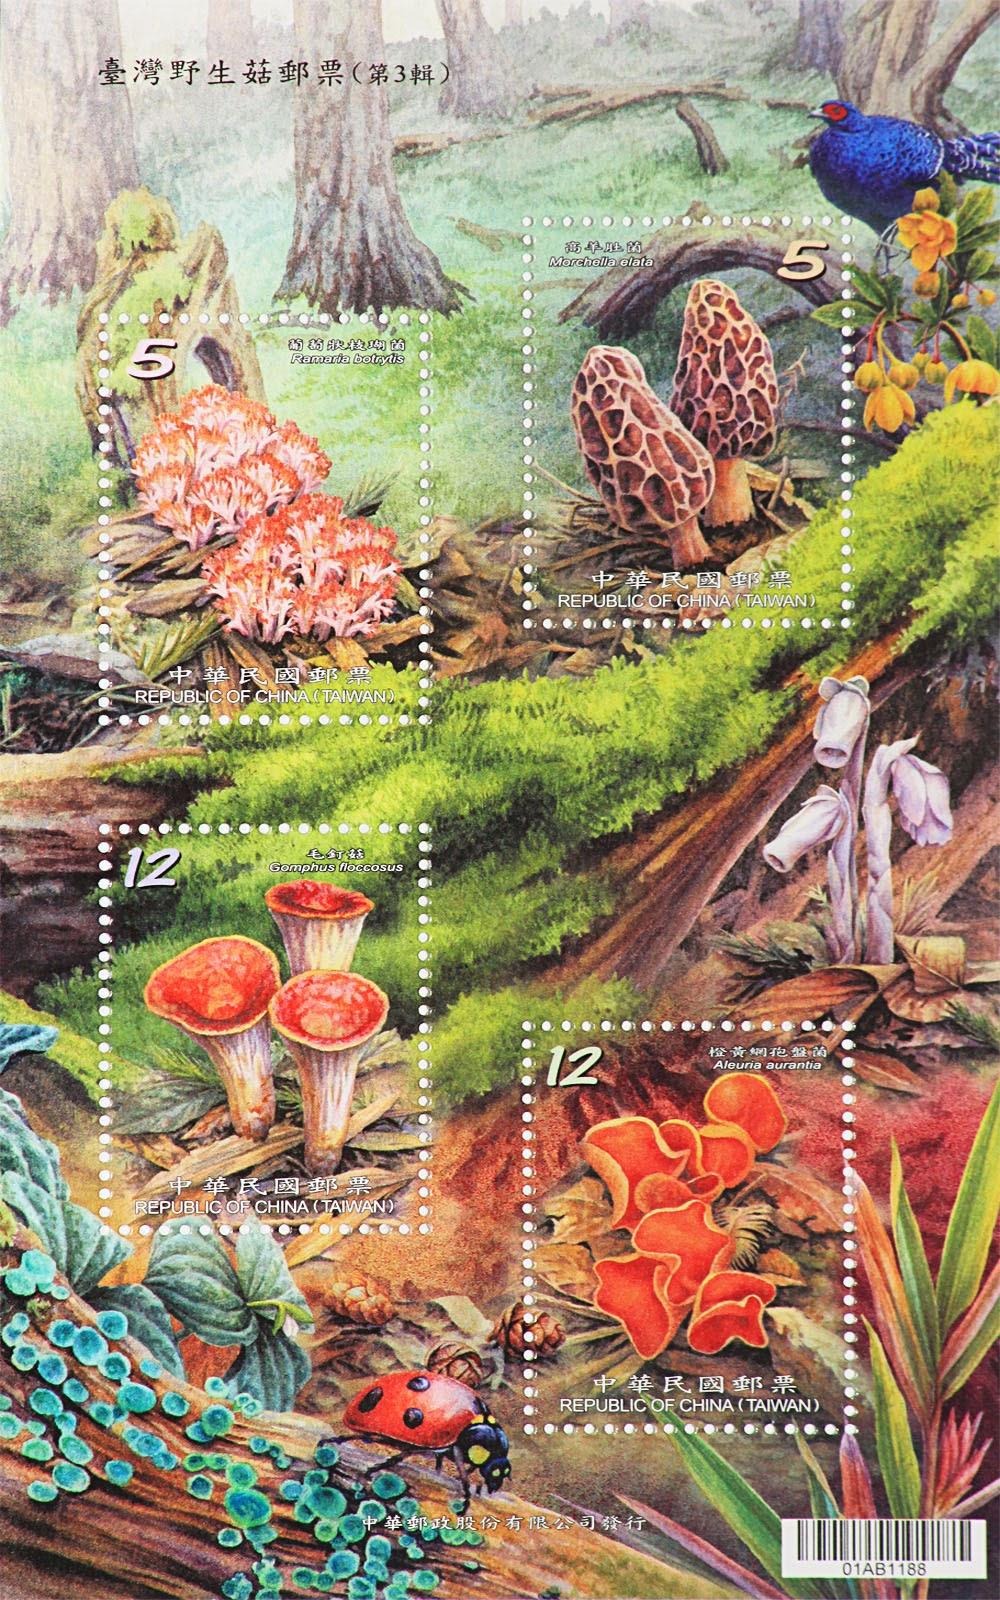 2013 Wild Mushrooms of Taiwan Miniature Sheet